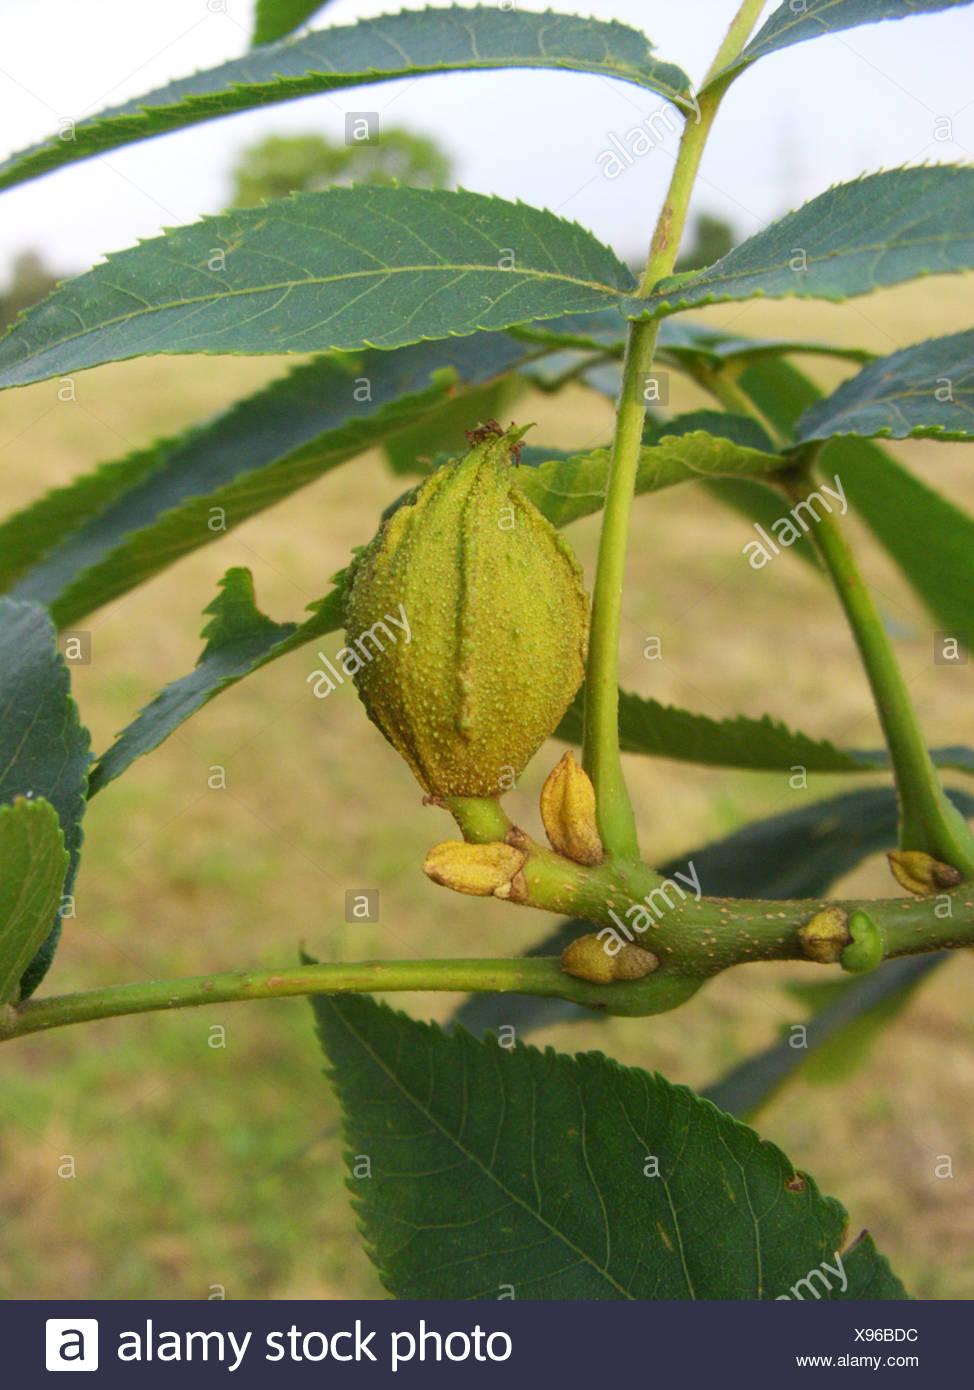 bitter-nut hickory, bitternut hockory (Carya cordiformis), branch with fruit Stock Photo